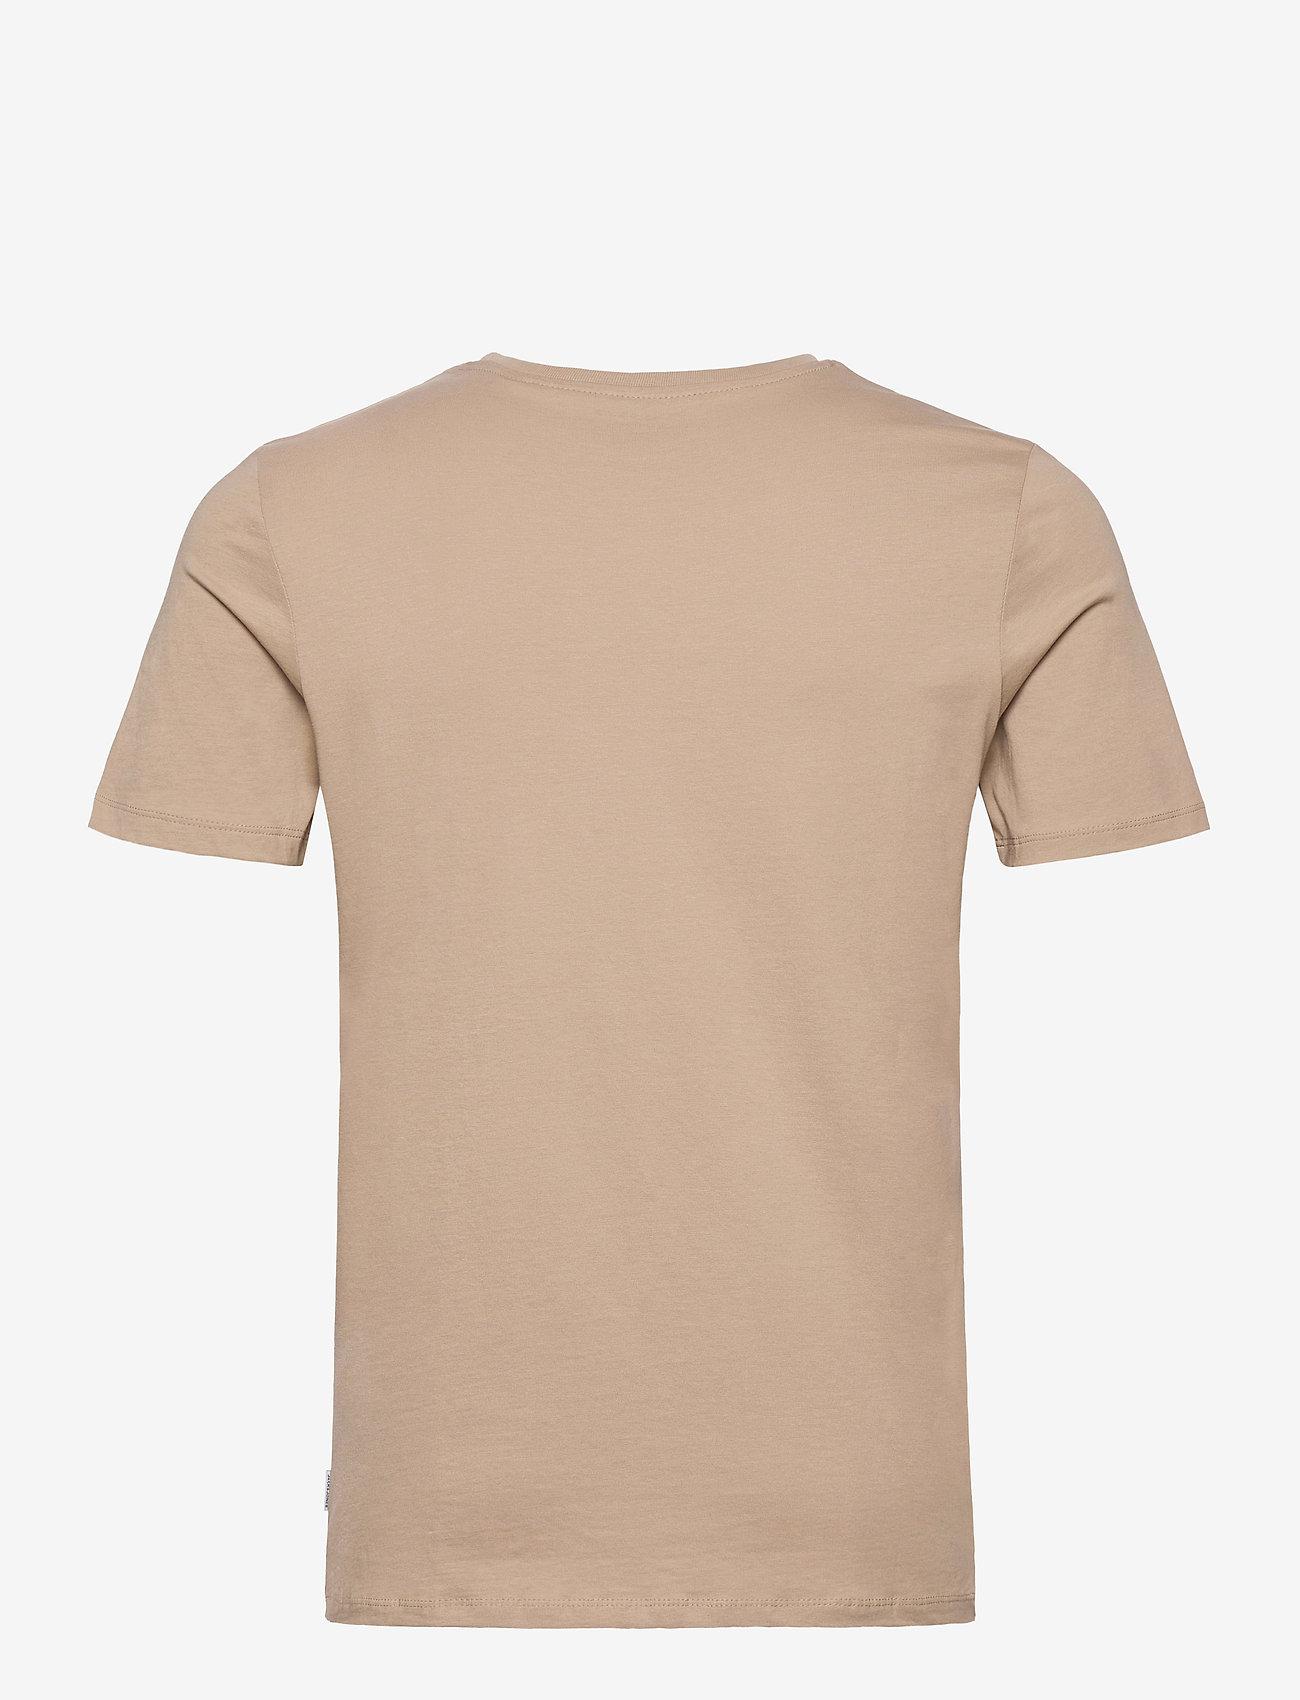 Jack & Jones - JJEORGANIC BASIC TEE SS O-NECK NOOS - basic t-shirts - crockery - 1